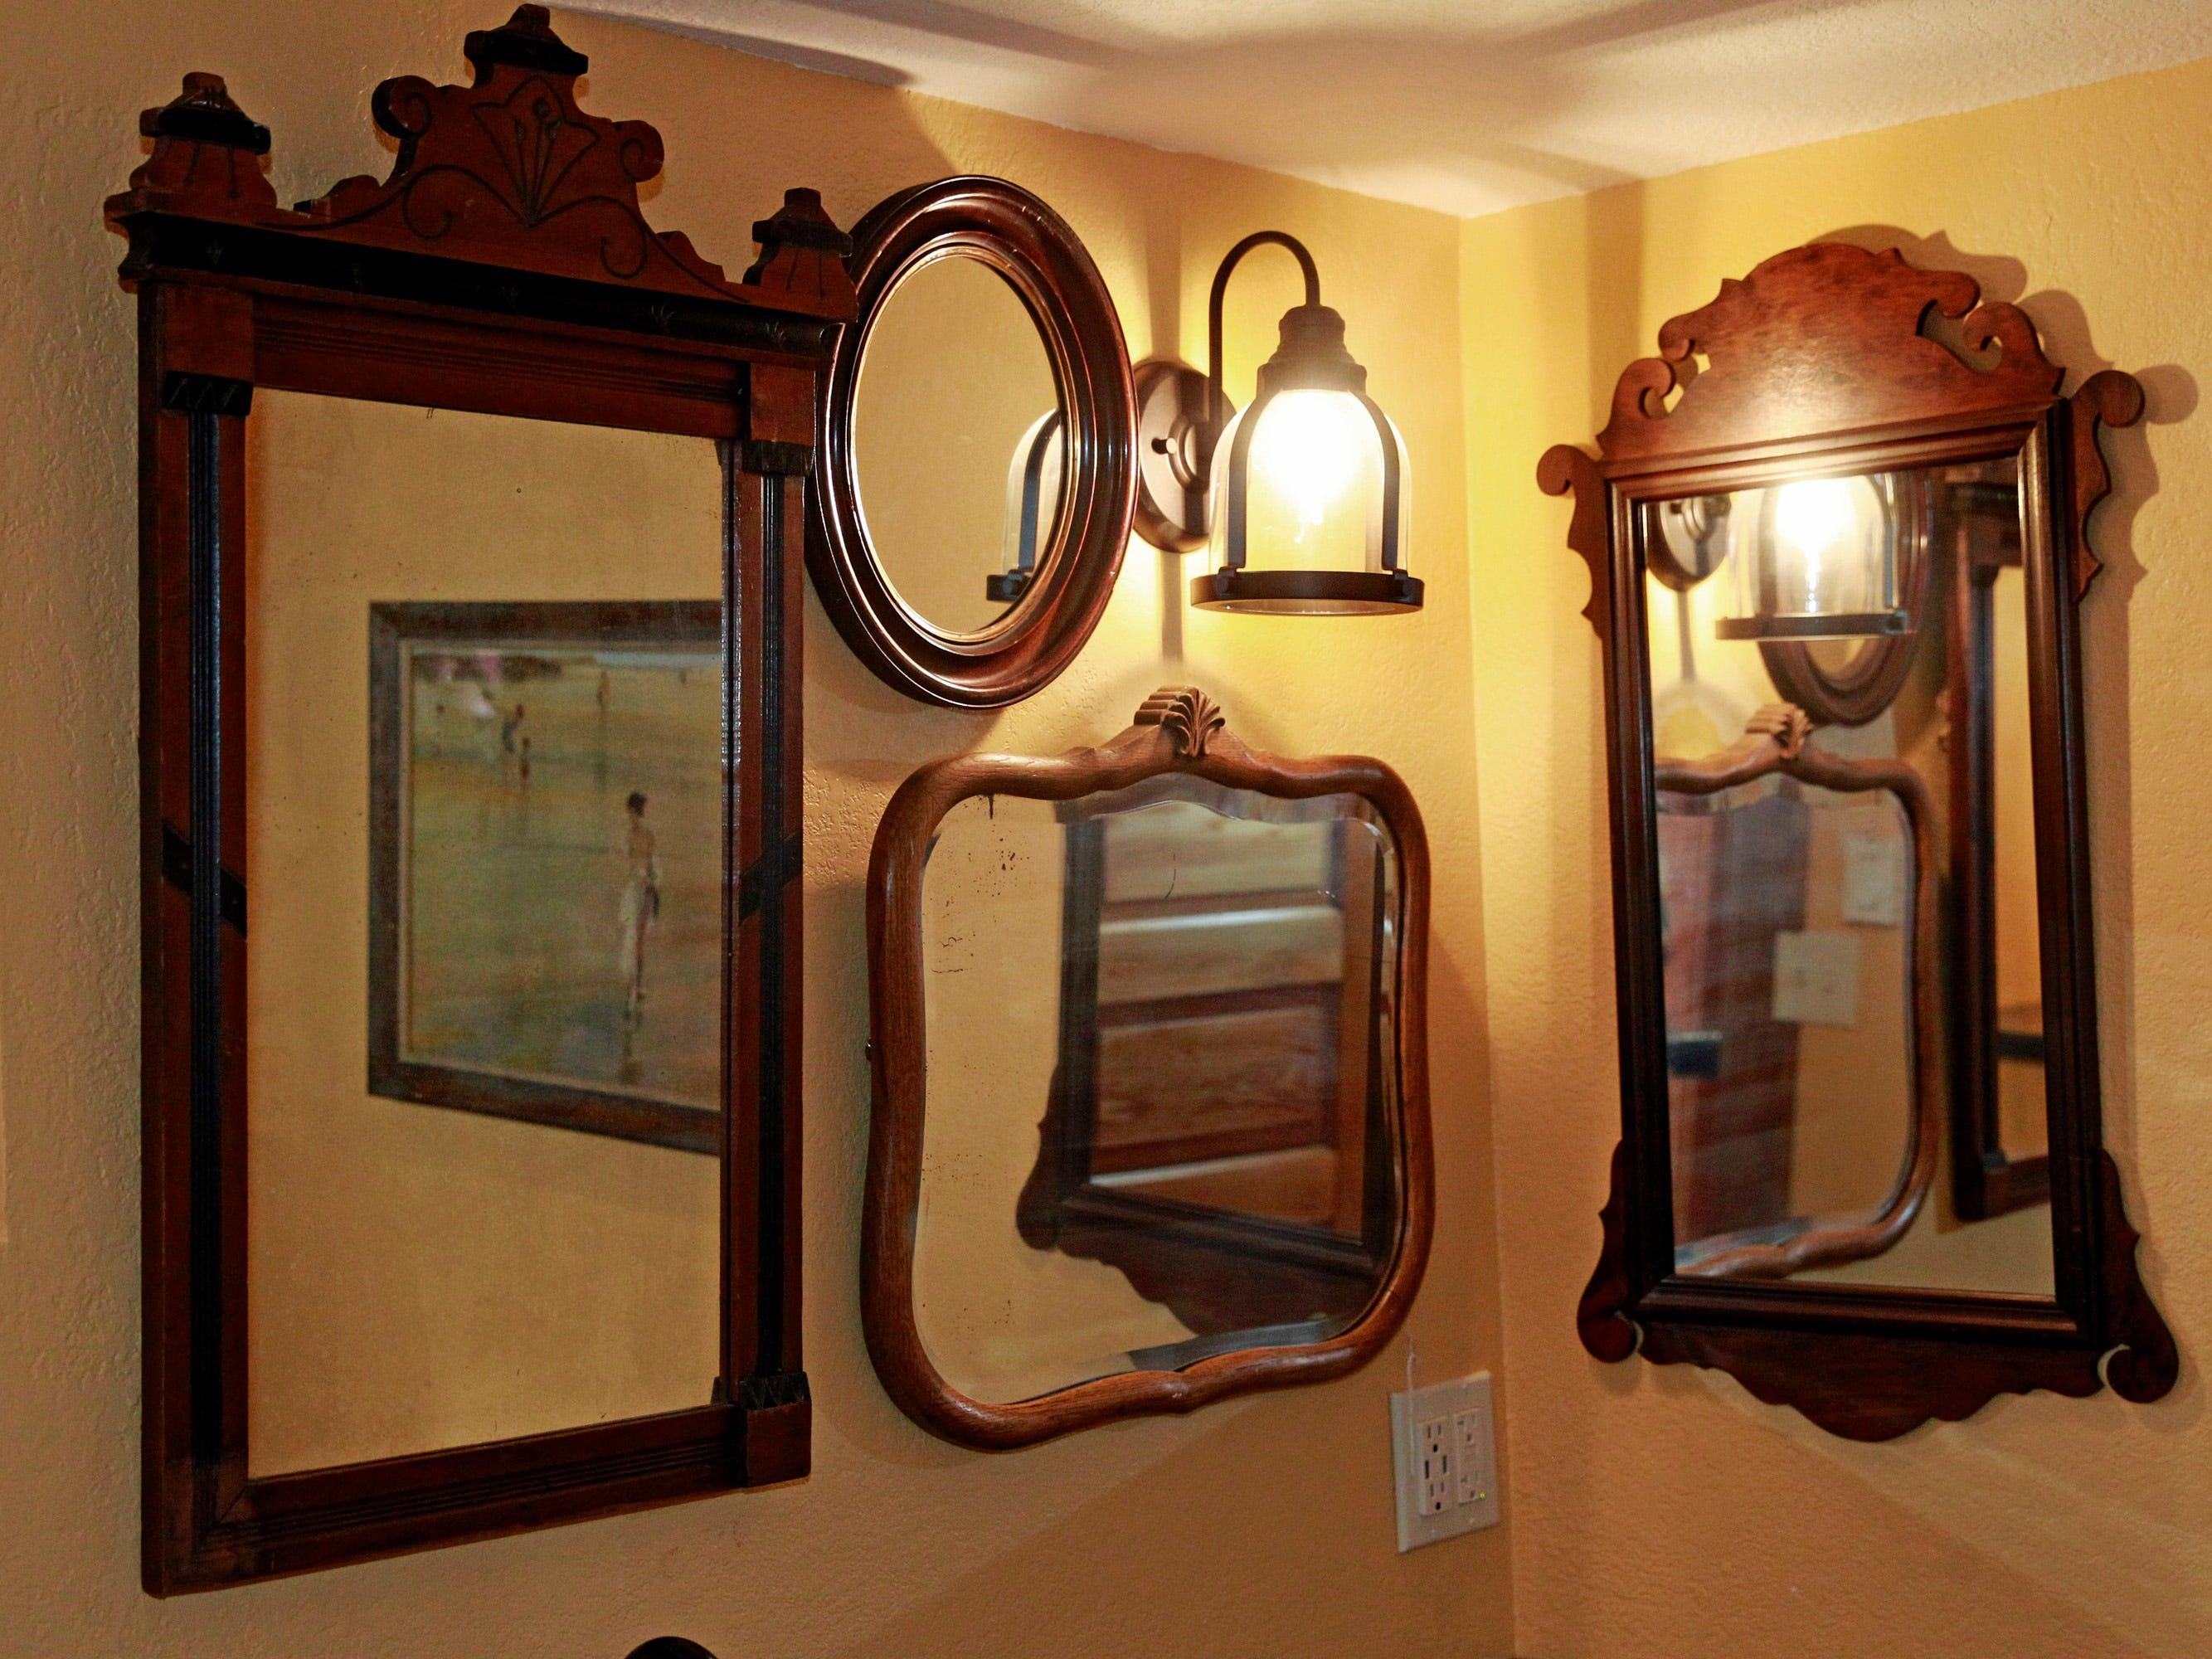 An assortment of antique mirrors  add interest to the basement bathroom.